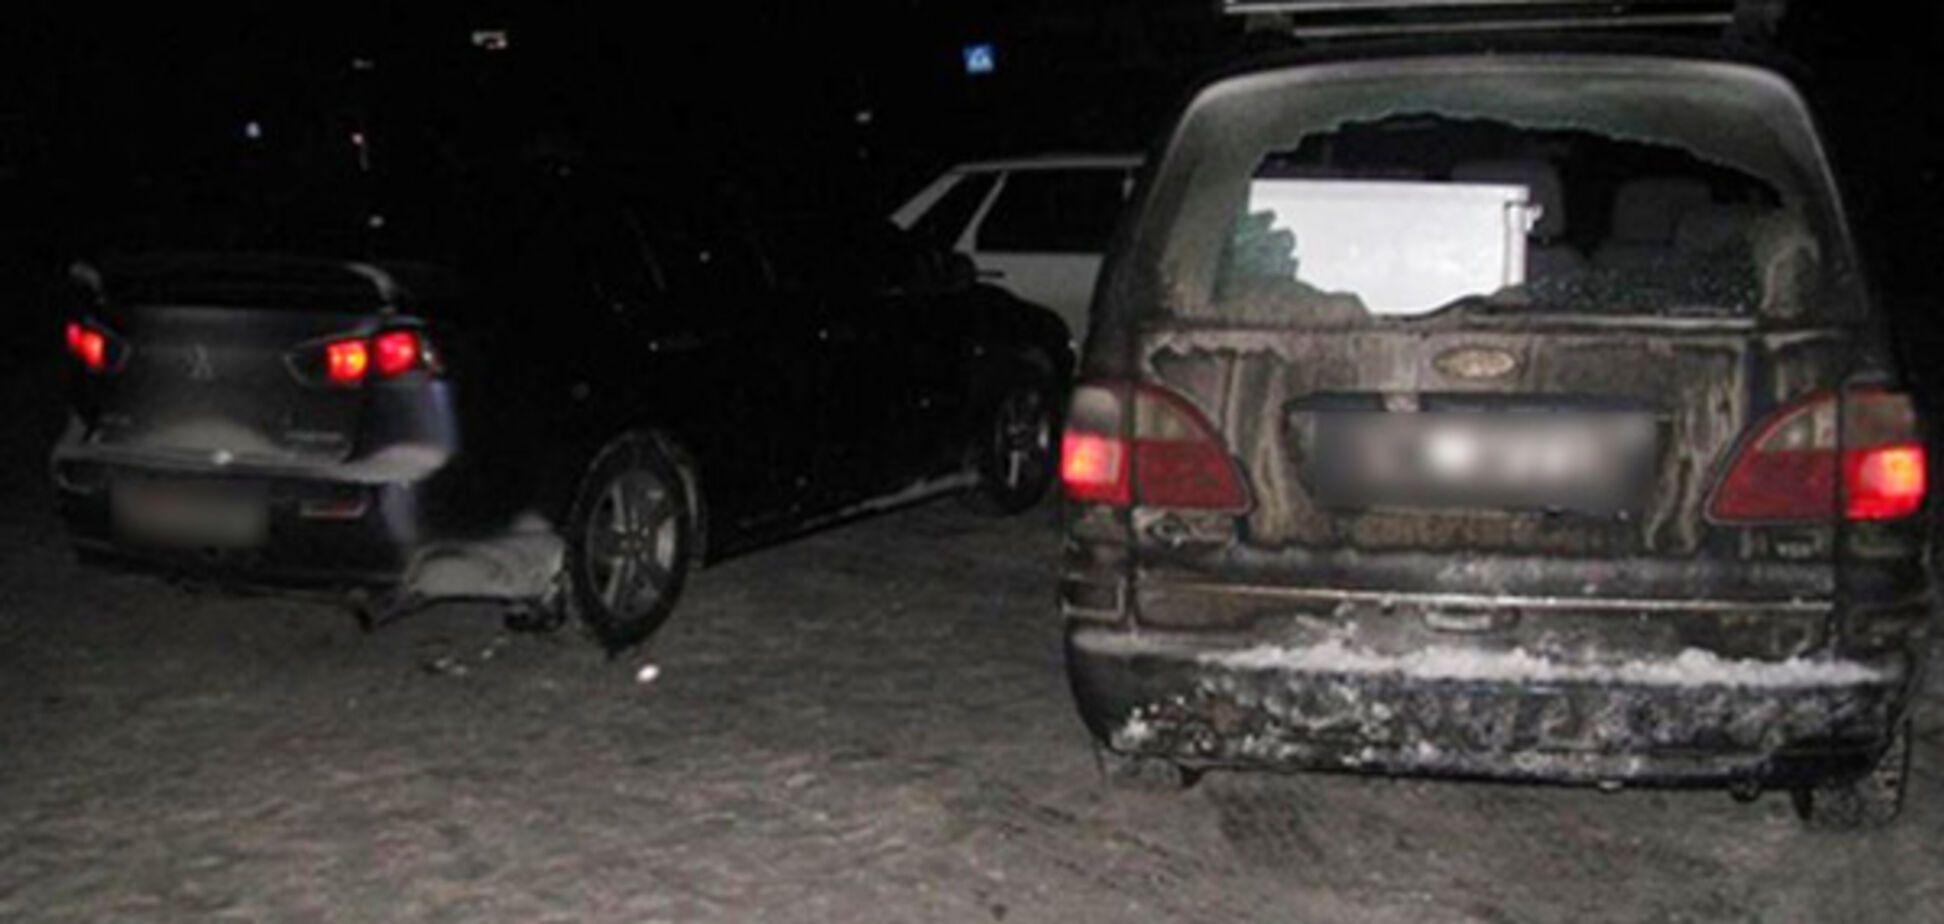 У Хмельницькій області обстріляли автомобіль